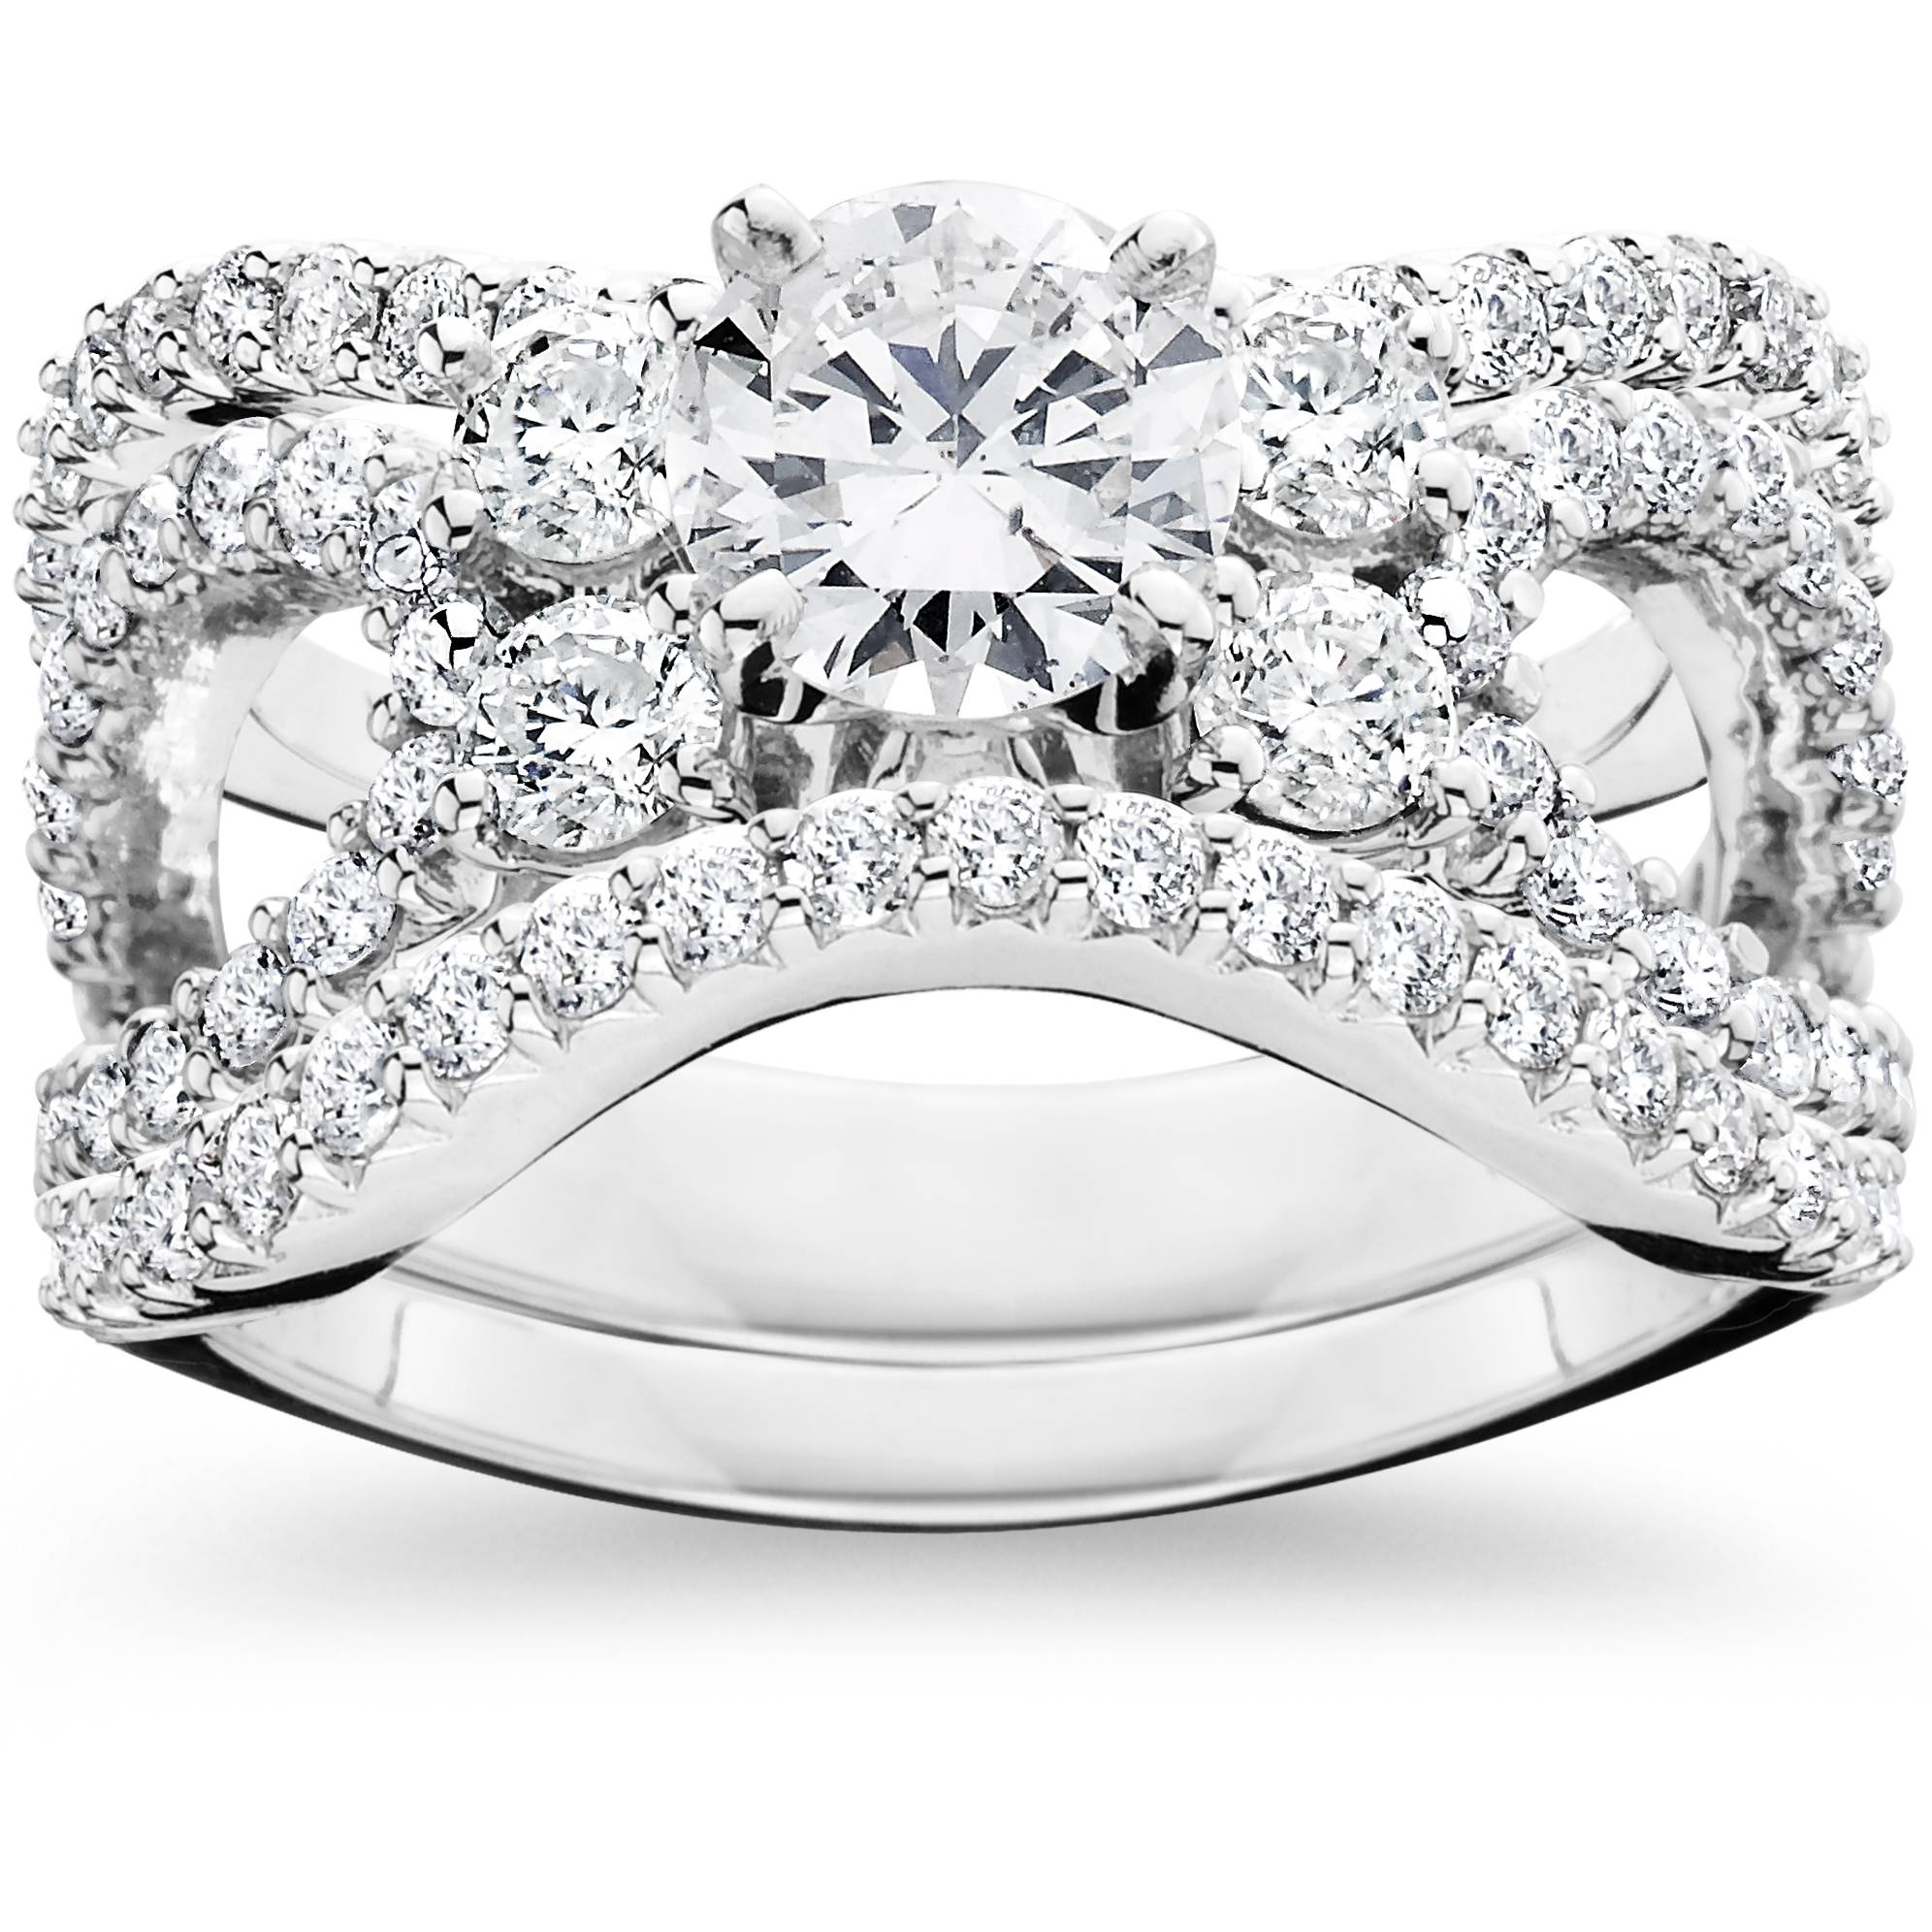 4.00Ct Diamond Engagement Trio Wedding Guard Ring Set 14K White Gold - image 4 of 4